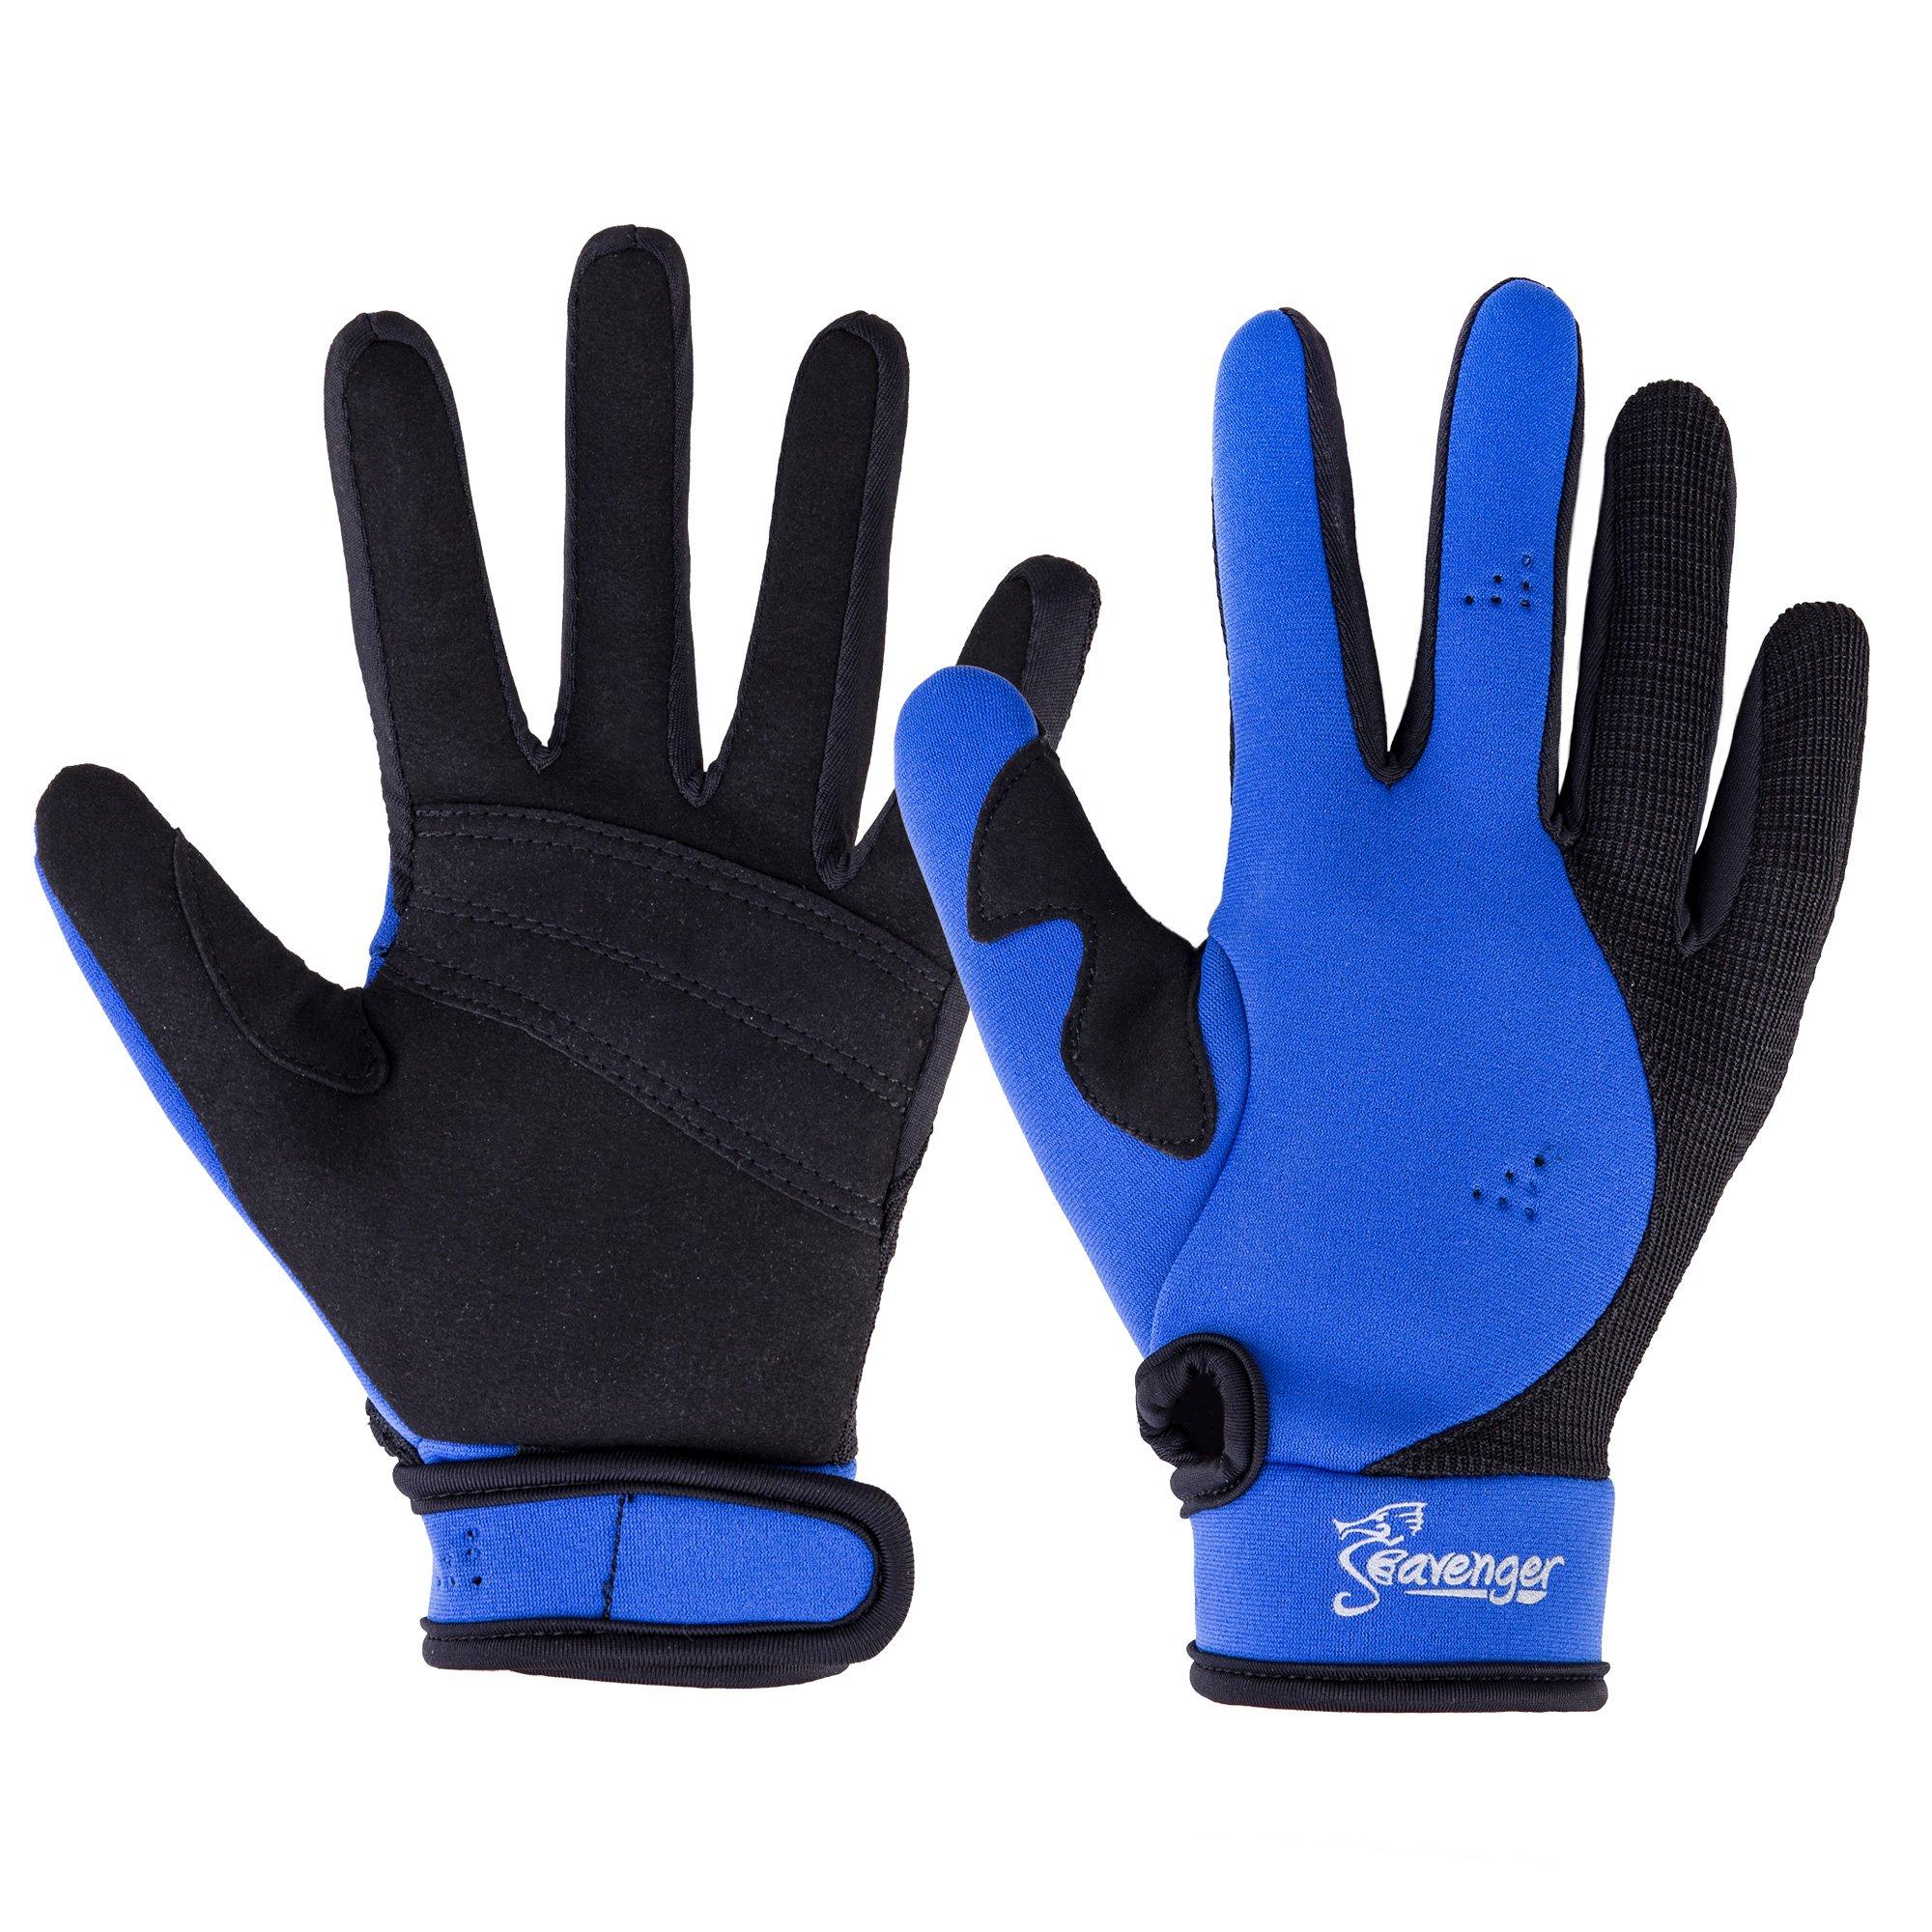 Seavenger Abyss Dive Gloves | 1.5mm Neoprene Mesh | Scuba Diving, Wakeboarding, Spearfishing (Blue, X-Small) by Seavenger